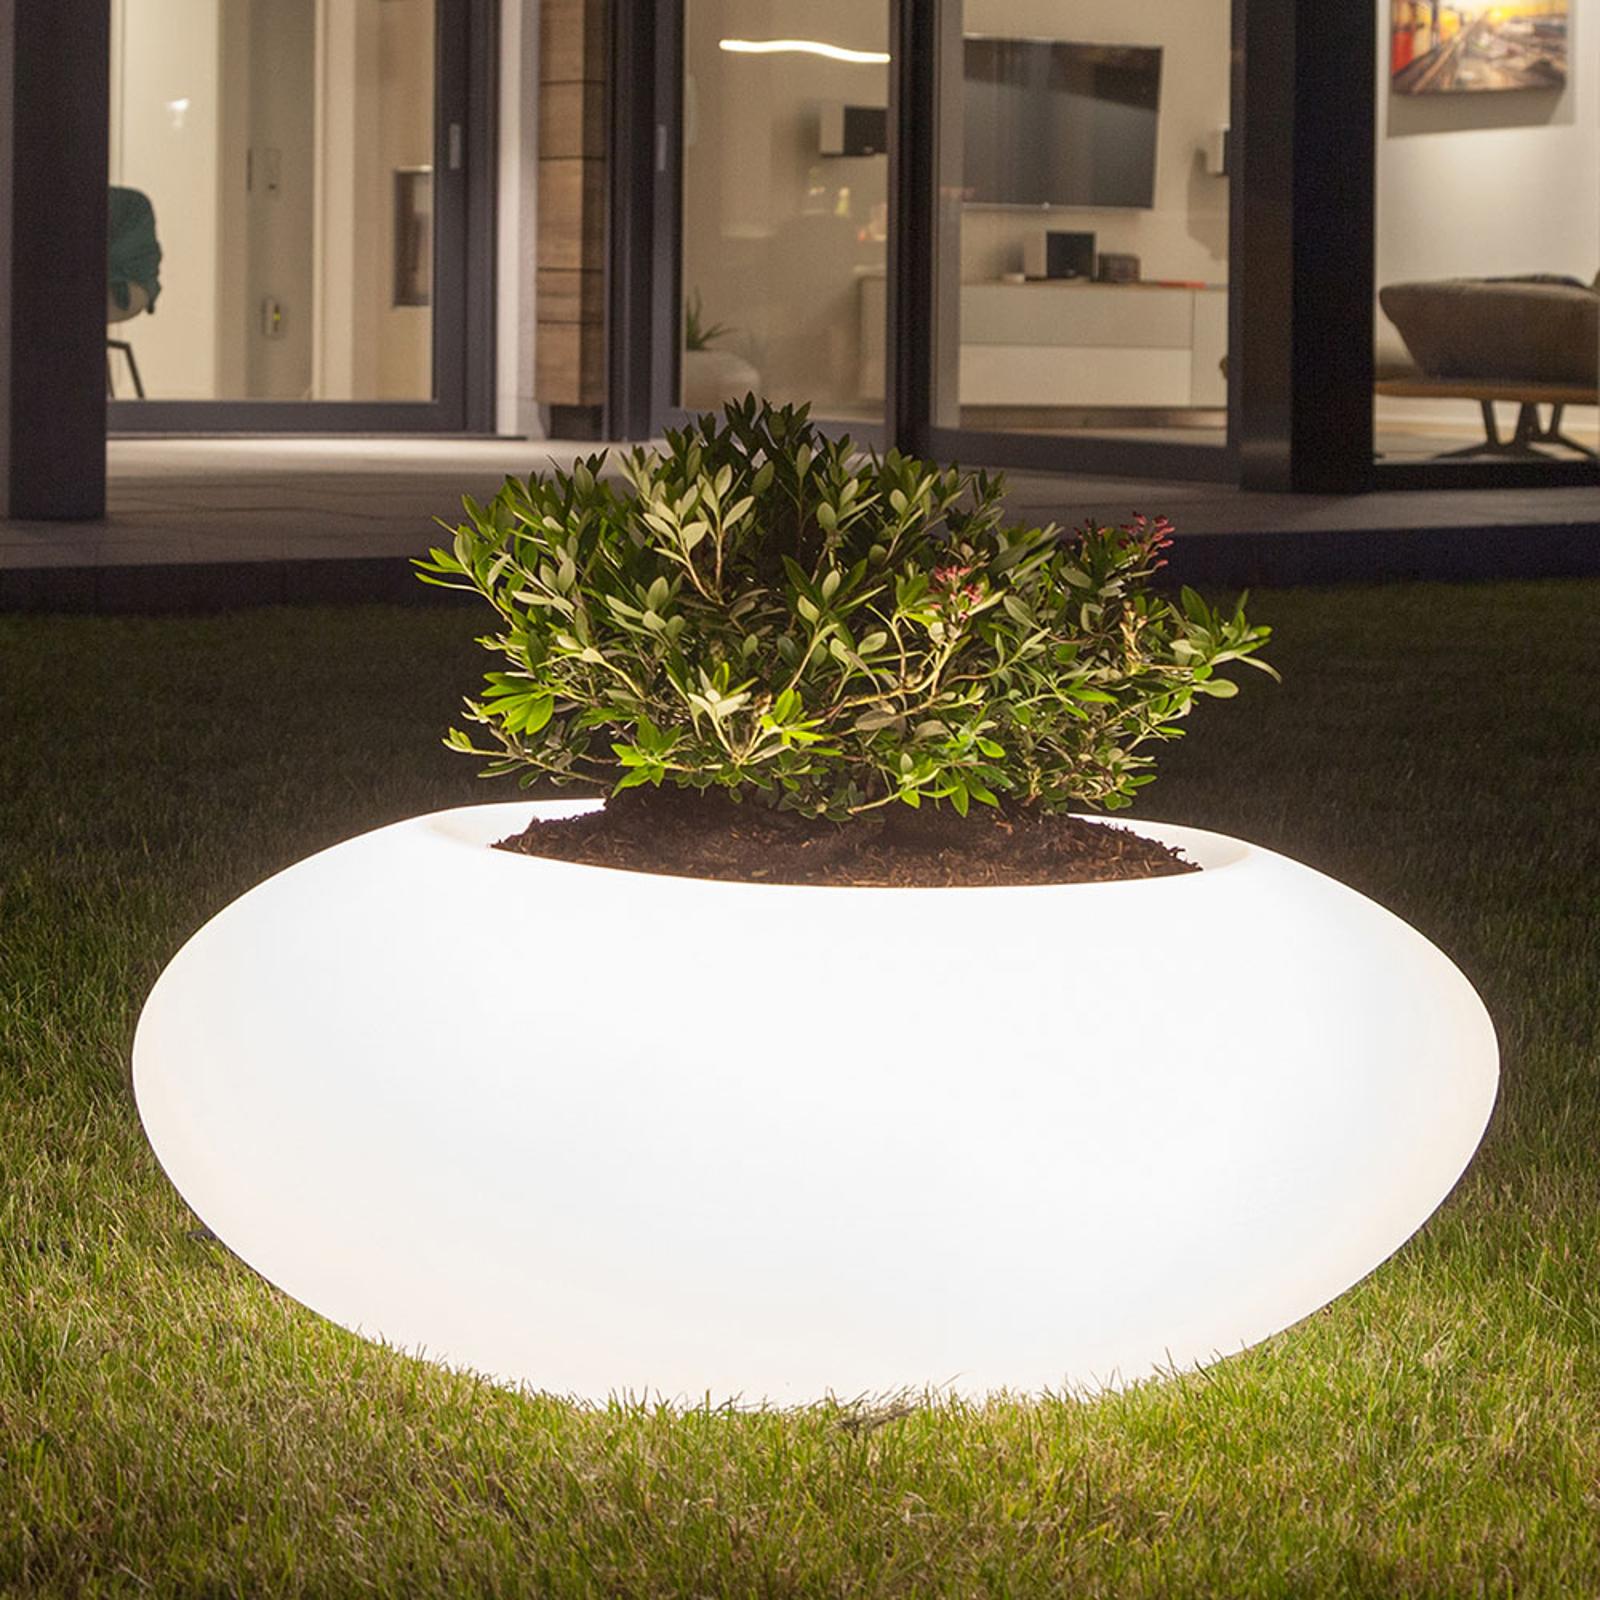 Storus VI LED RGBW dekolampe, kan beplantes, hvid